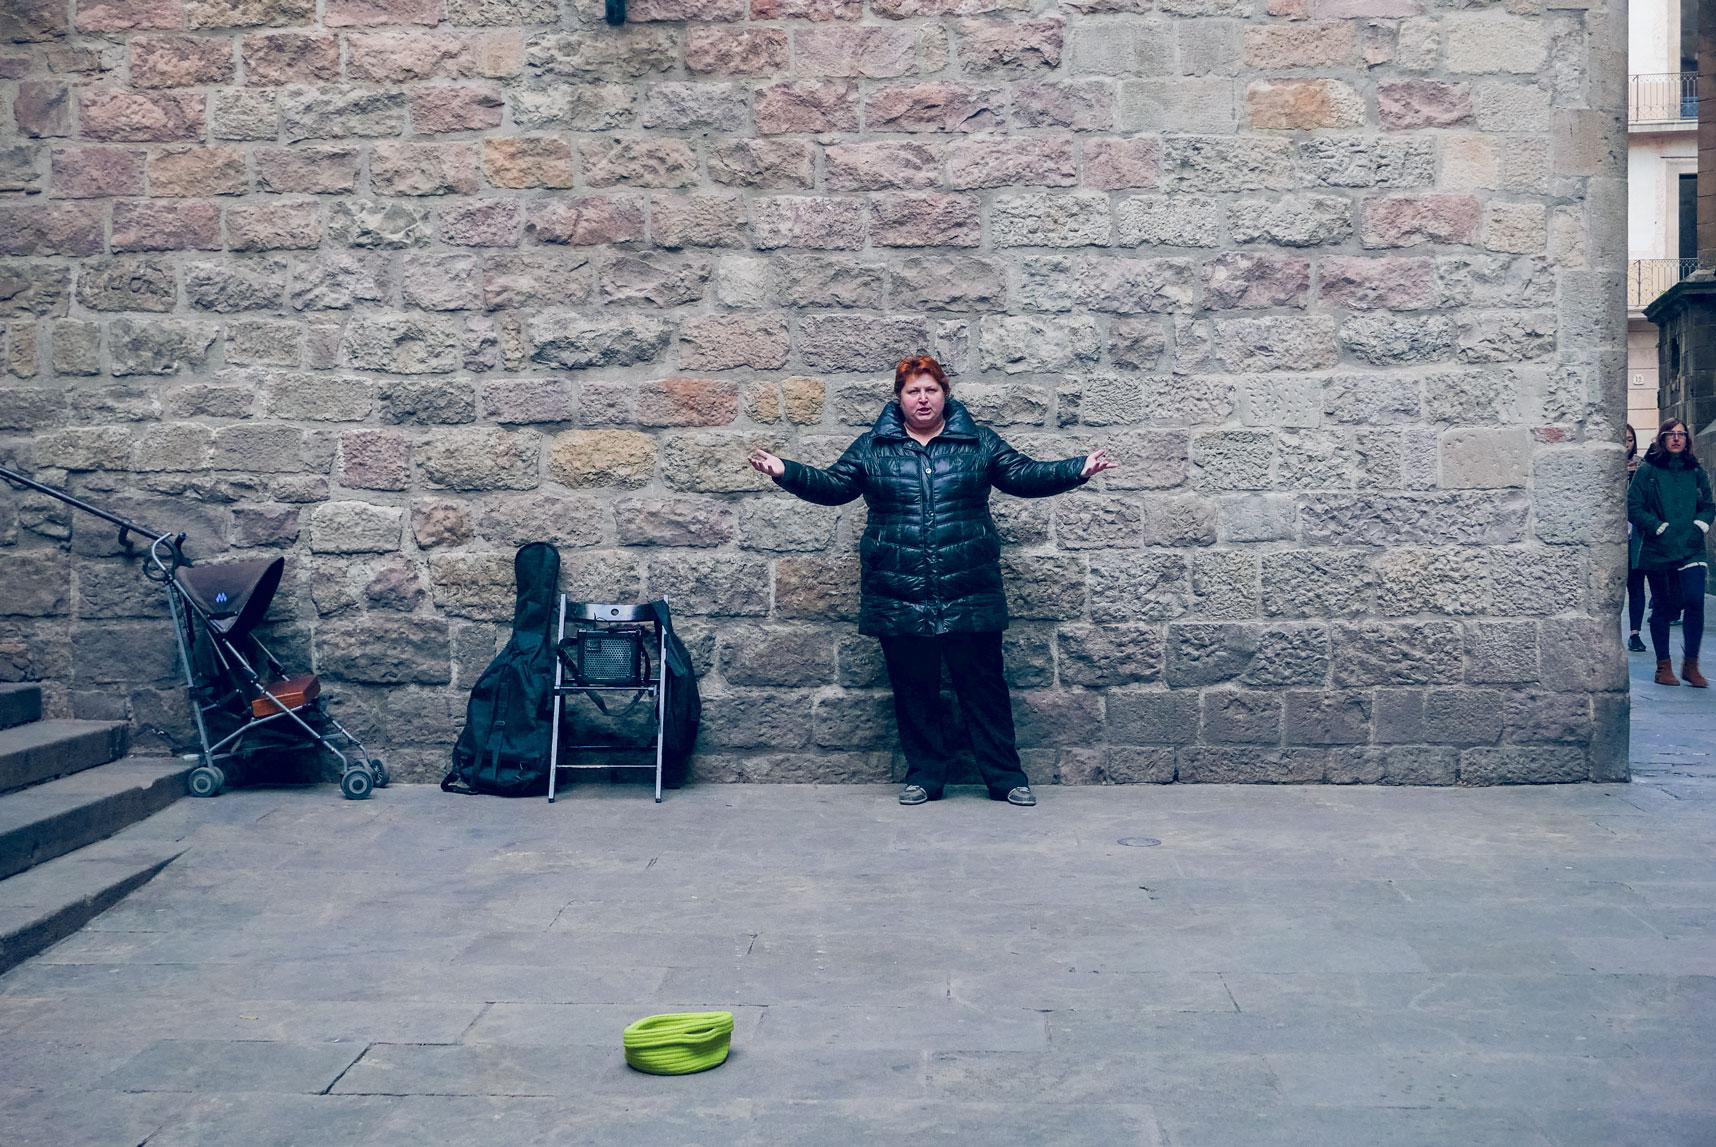 Spain Barcelona Barrio Gotico opera street artist 2